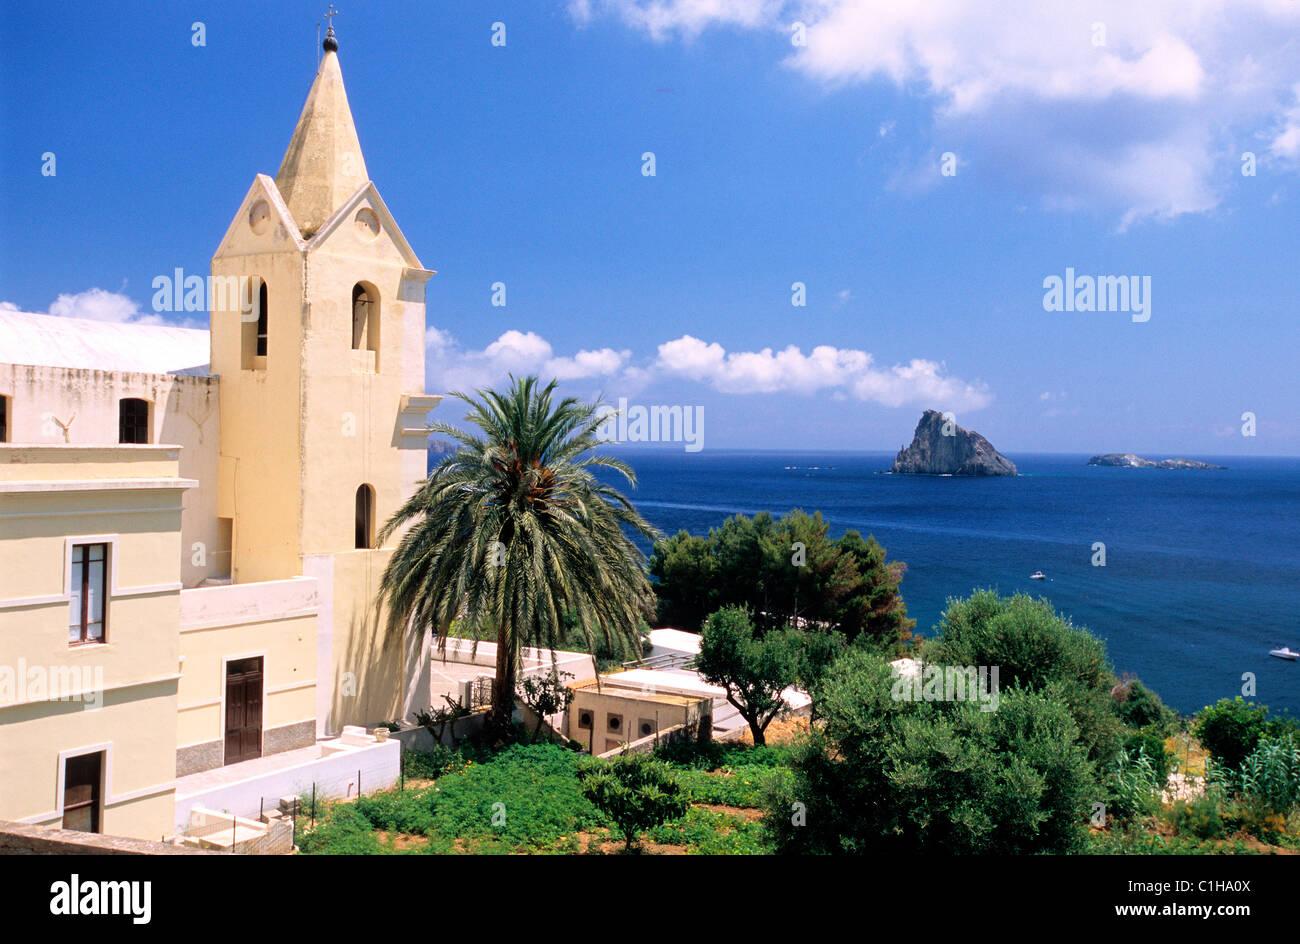 Italy sicily aeolian islands island of panarea san pietro italy sicily aeolian islands island of panarea san pietro church sciox Gallery